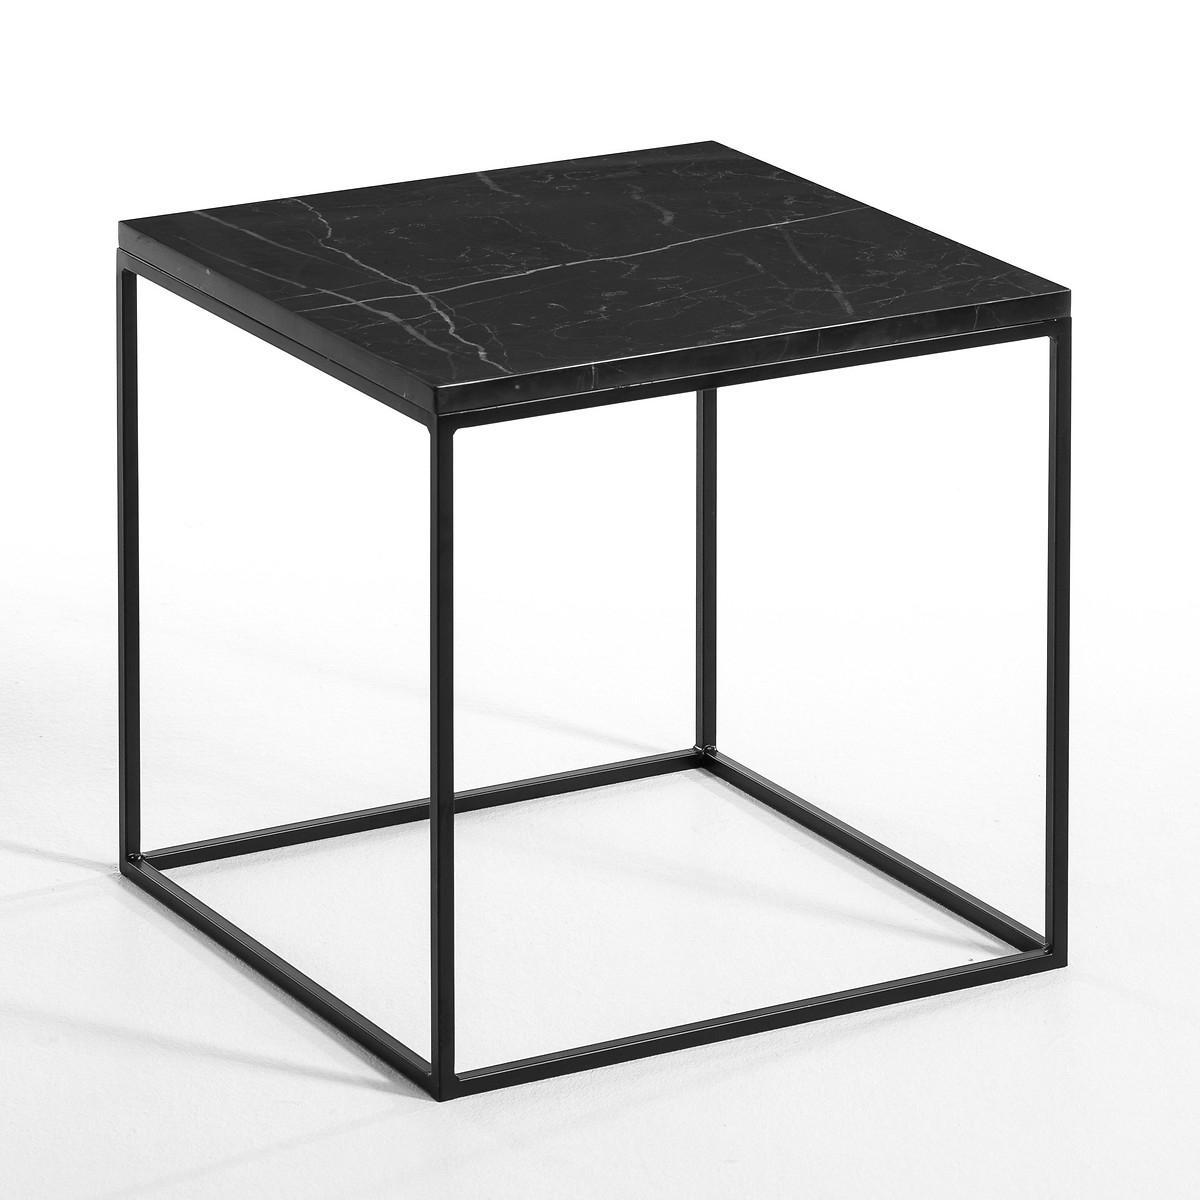 Столик LaRedoute Со столешницей из мрамора Mahaut единый размер черный стол laredoute журнальный со столешницей из белого мрамора и дуба crueso единый размер бежевый